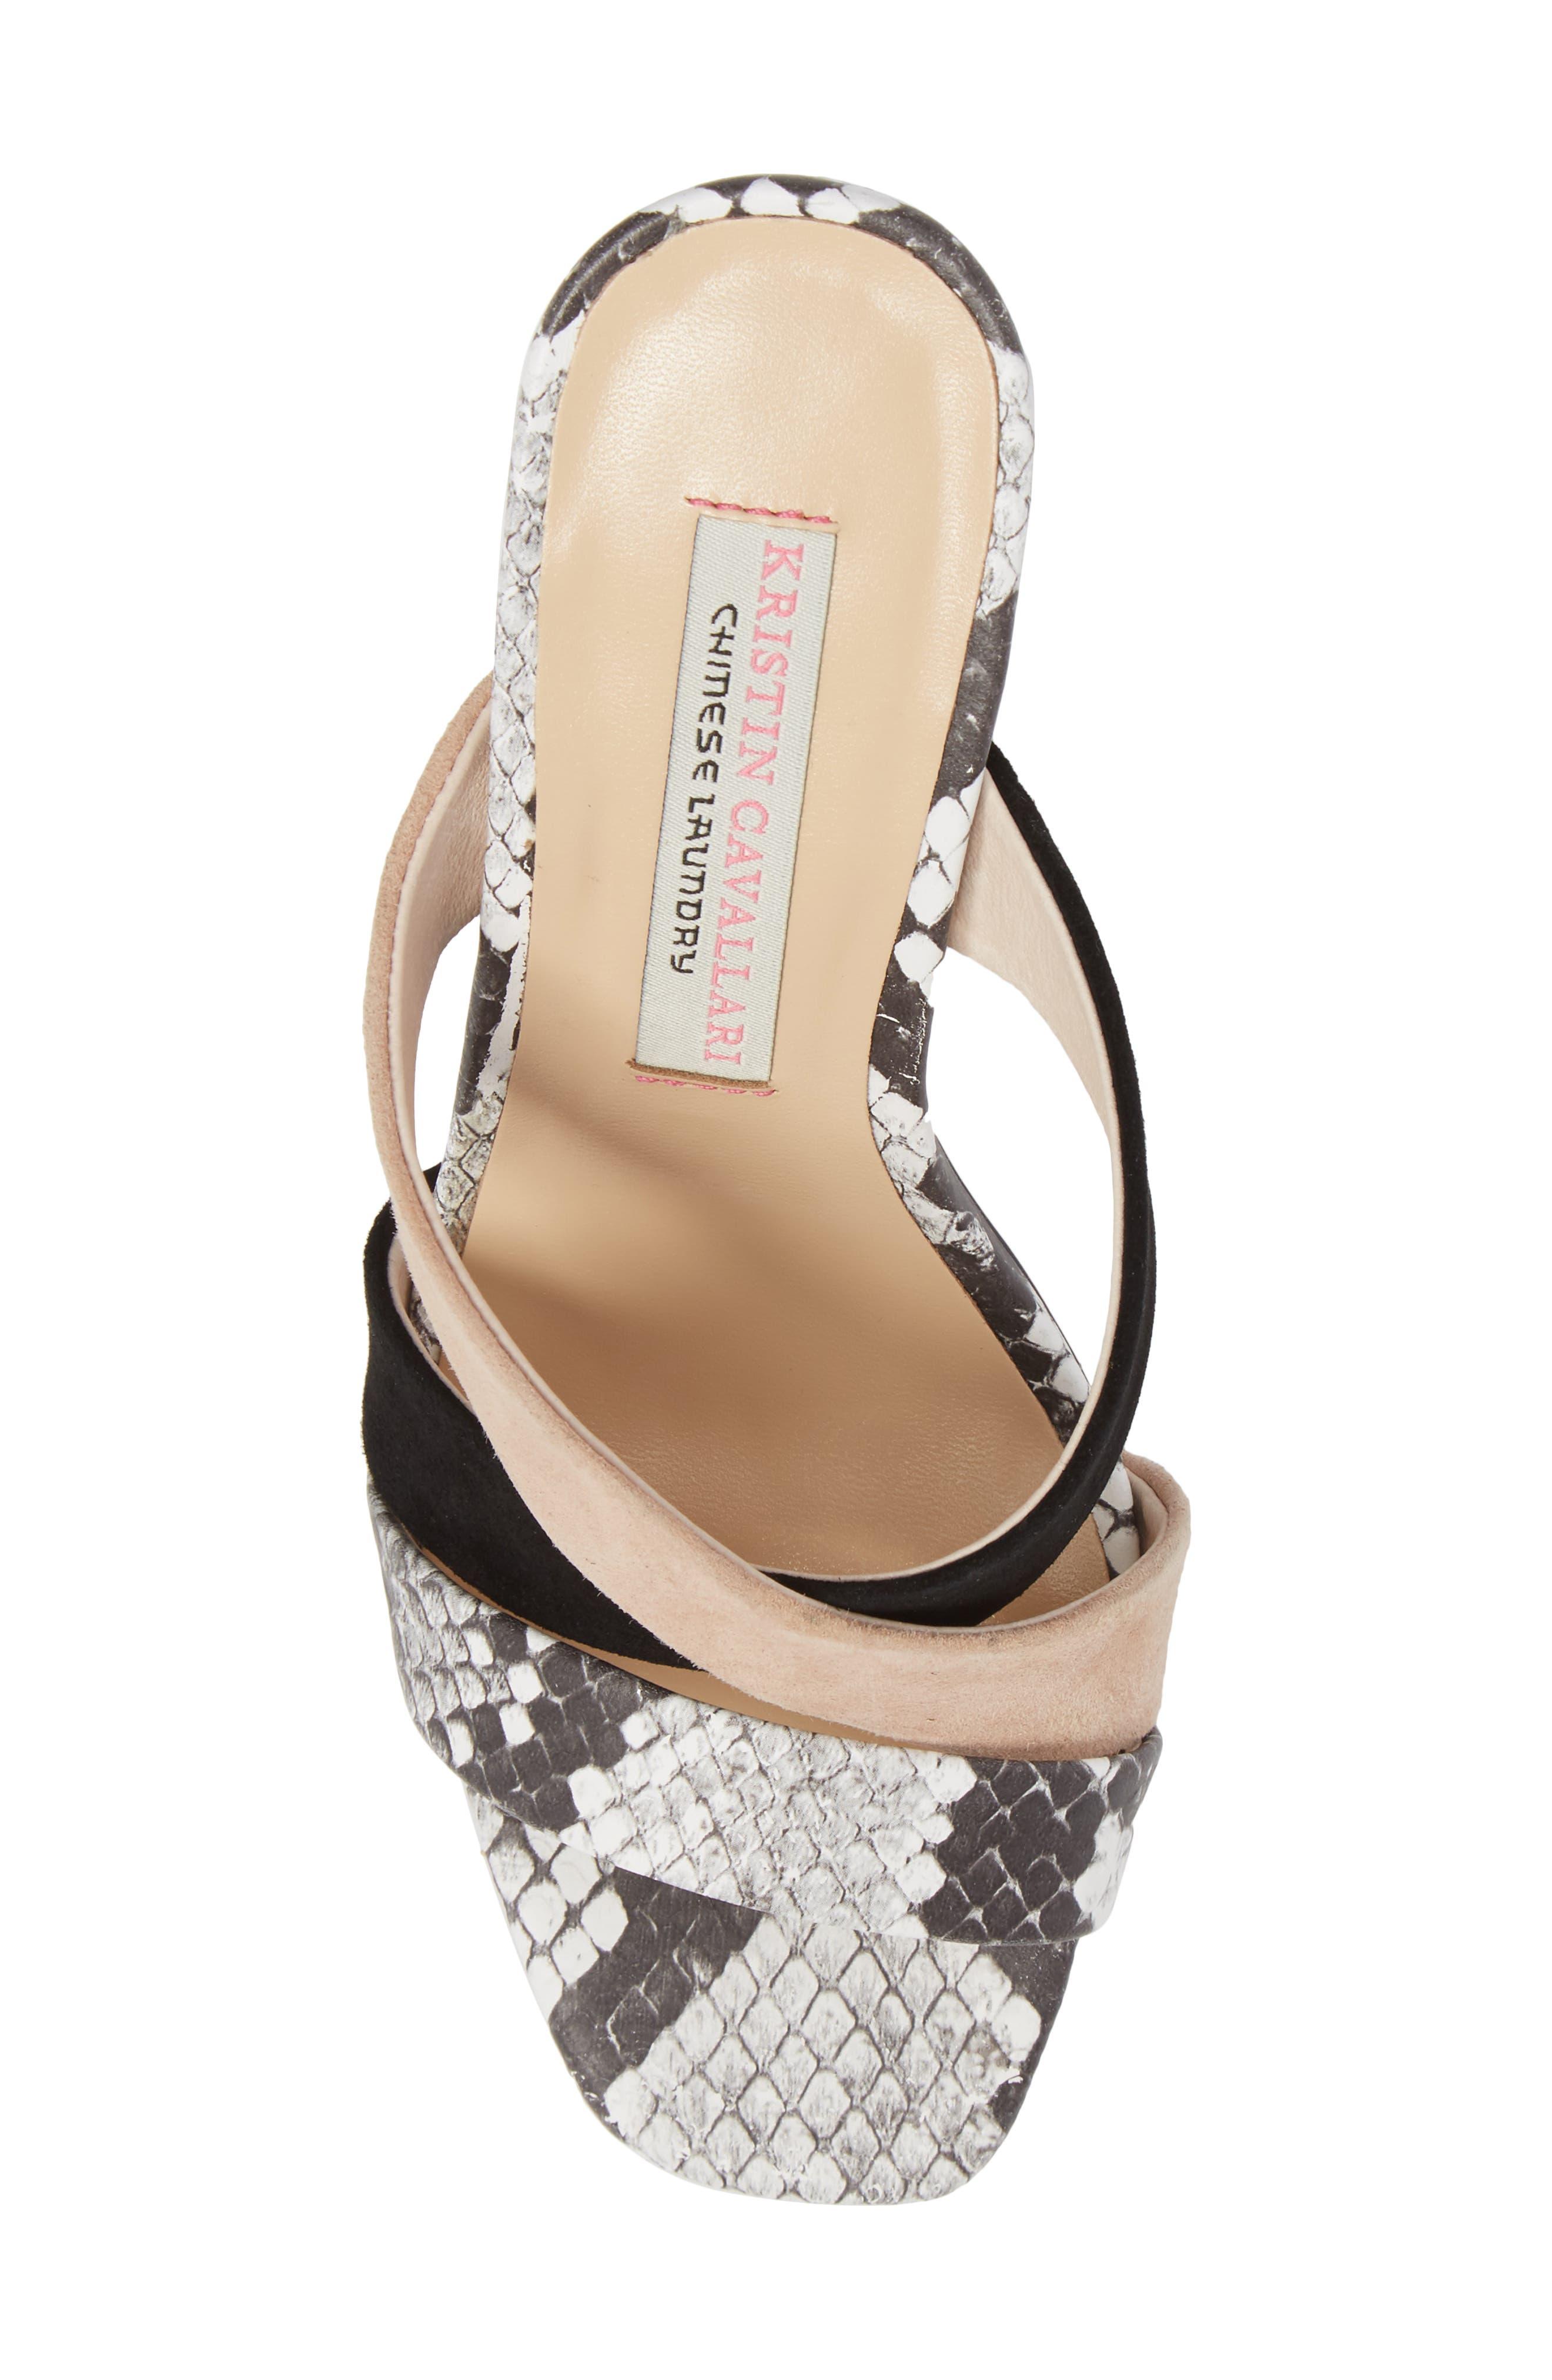 Lola Slide Sandal,                             Alternate thumbnail 5, color,                             Grey/ White Print Leather